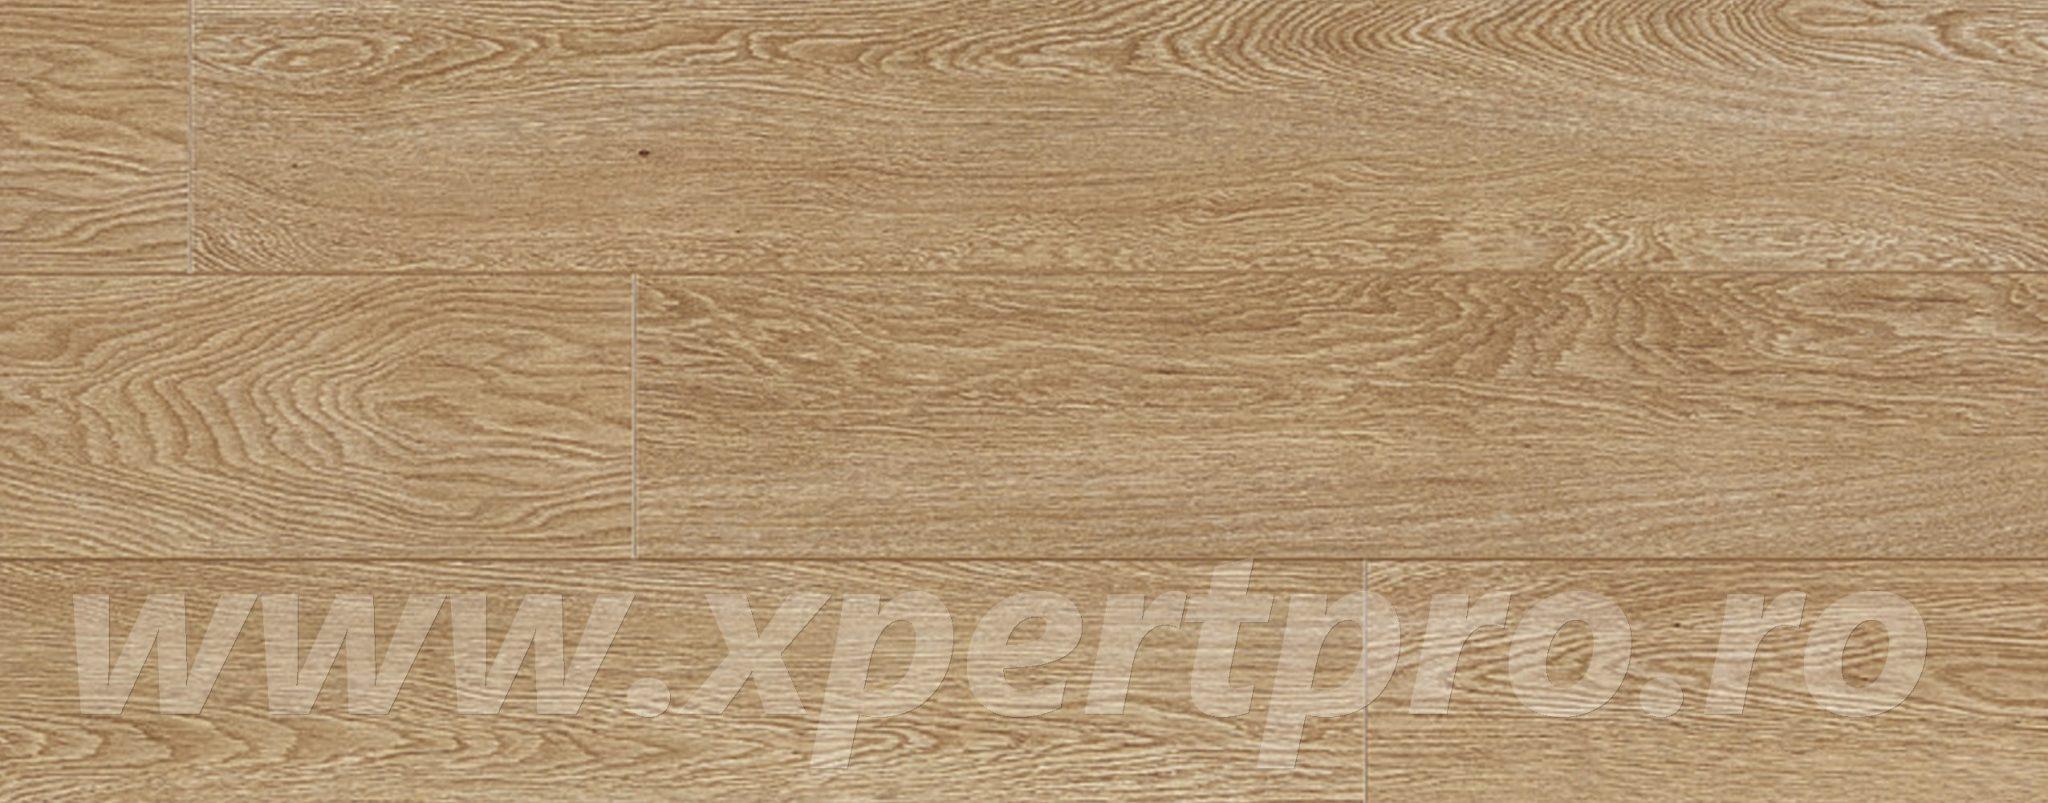 Parchet laminat Balterio Xpert Pro Barley Oak 706